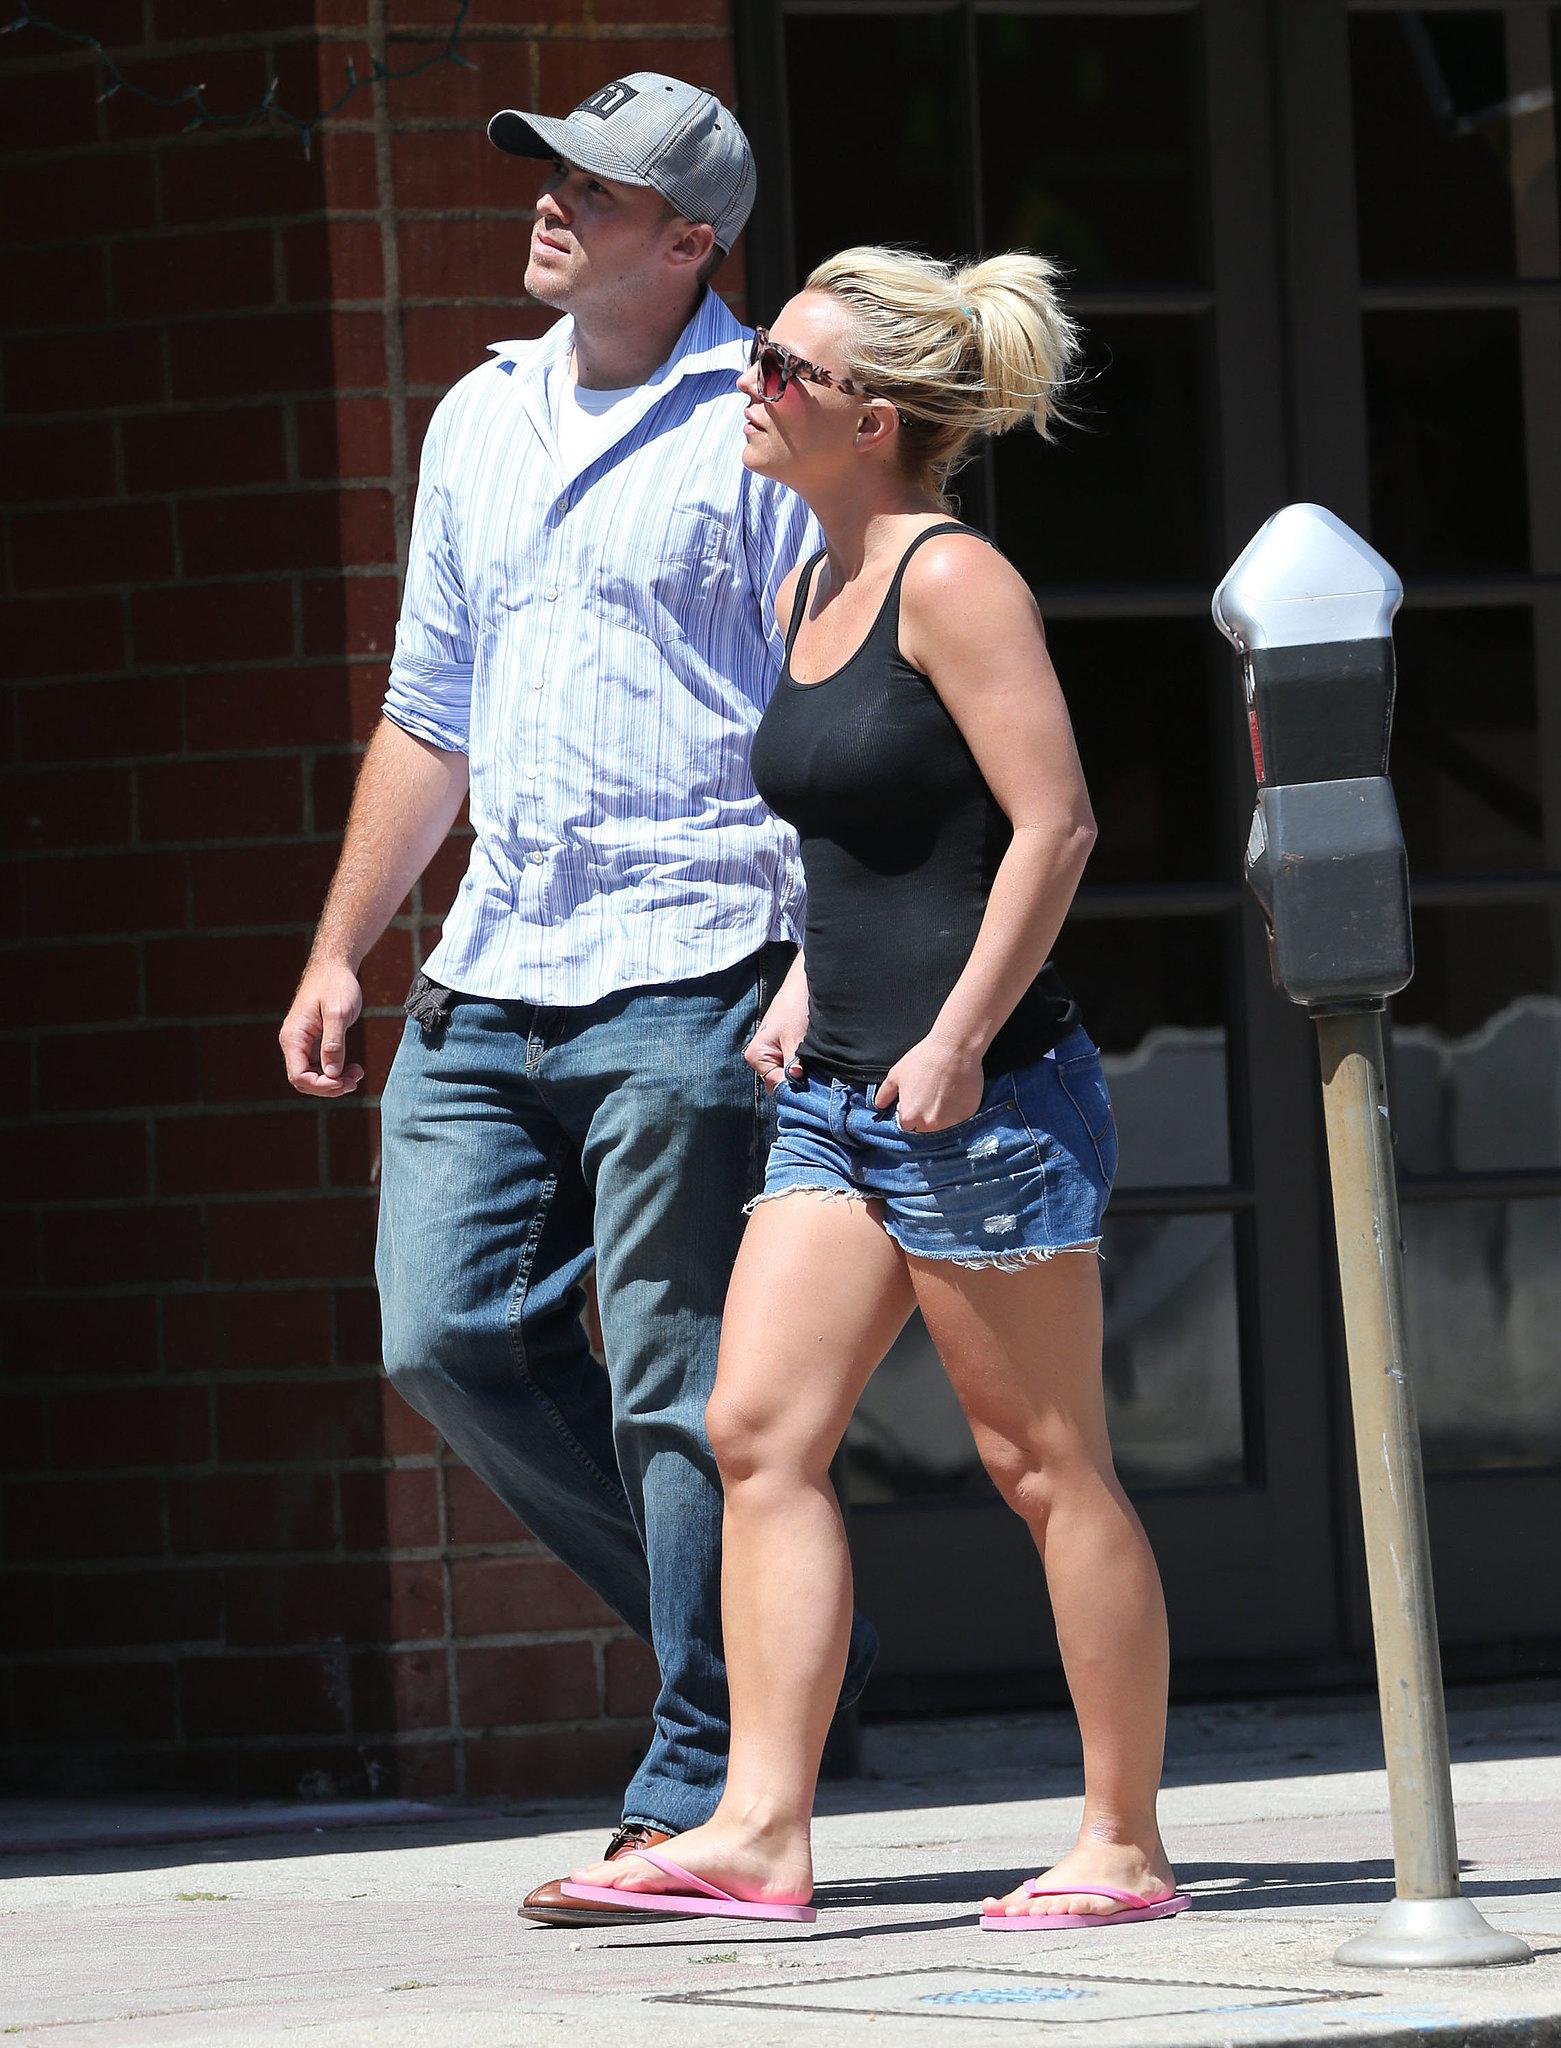 Ooh La La: Britney Spears Has a Lunch Date With David Lucado